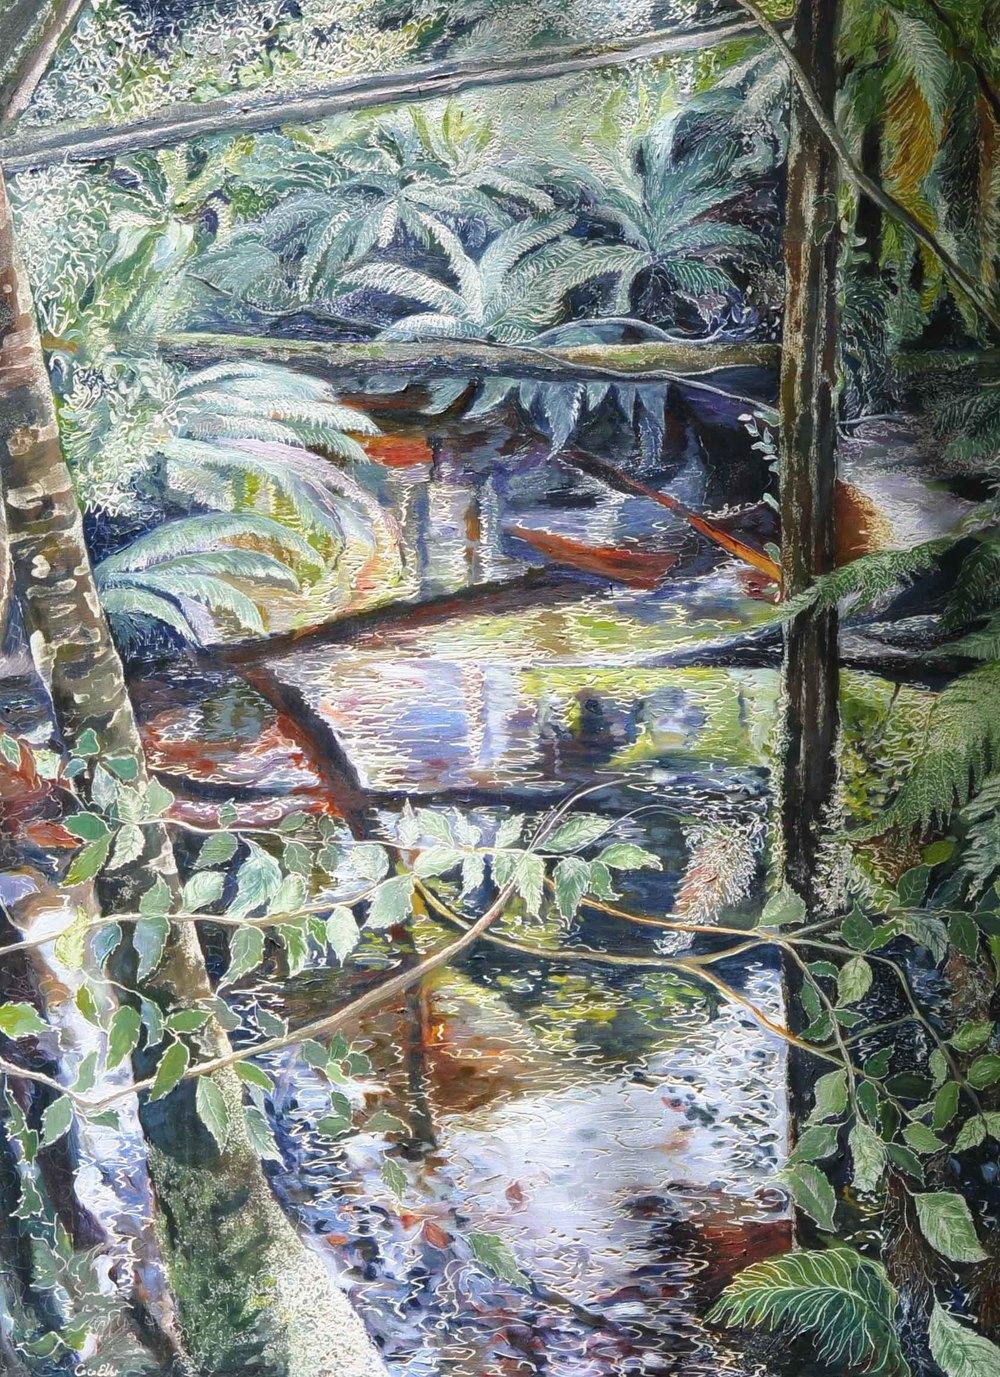 Title: Botanical Creek -Enchanted